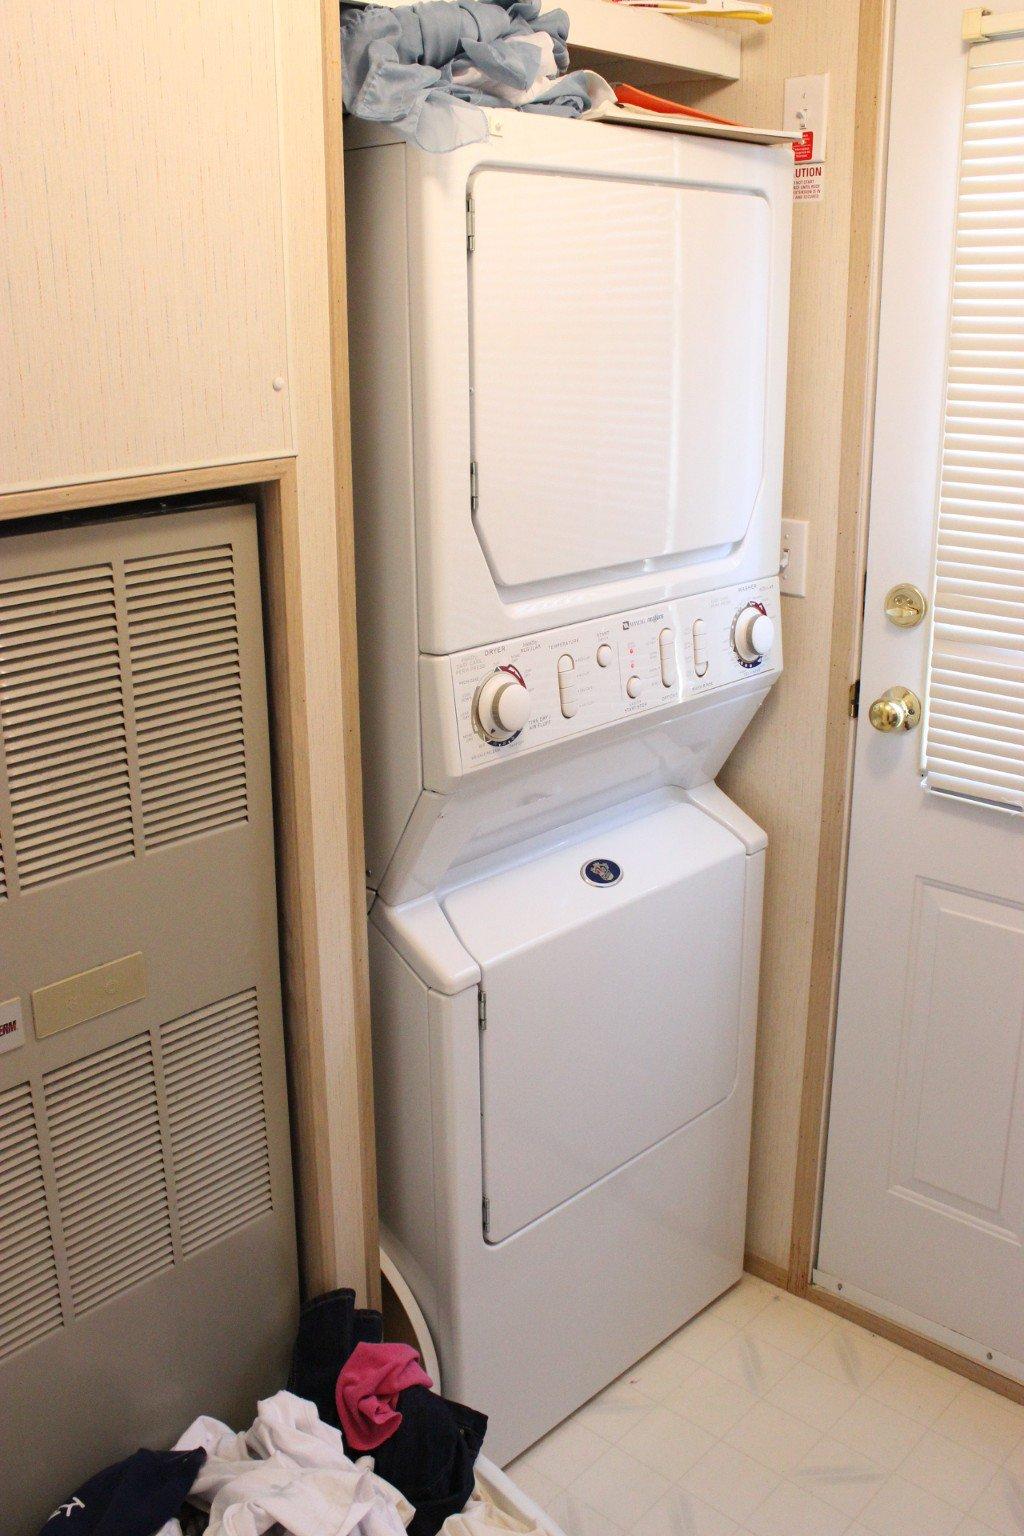 Photo 8: Photos: 4 2805 Westsyde Road in Kamloops: Westsyde Manufactured Home for sale : MLS®# 119353